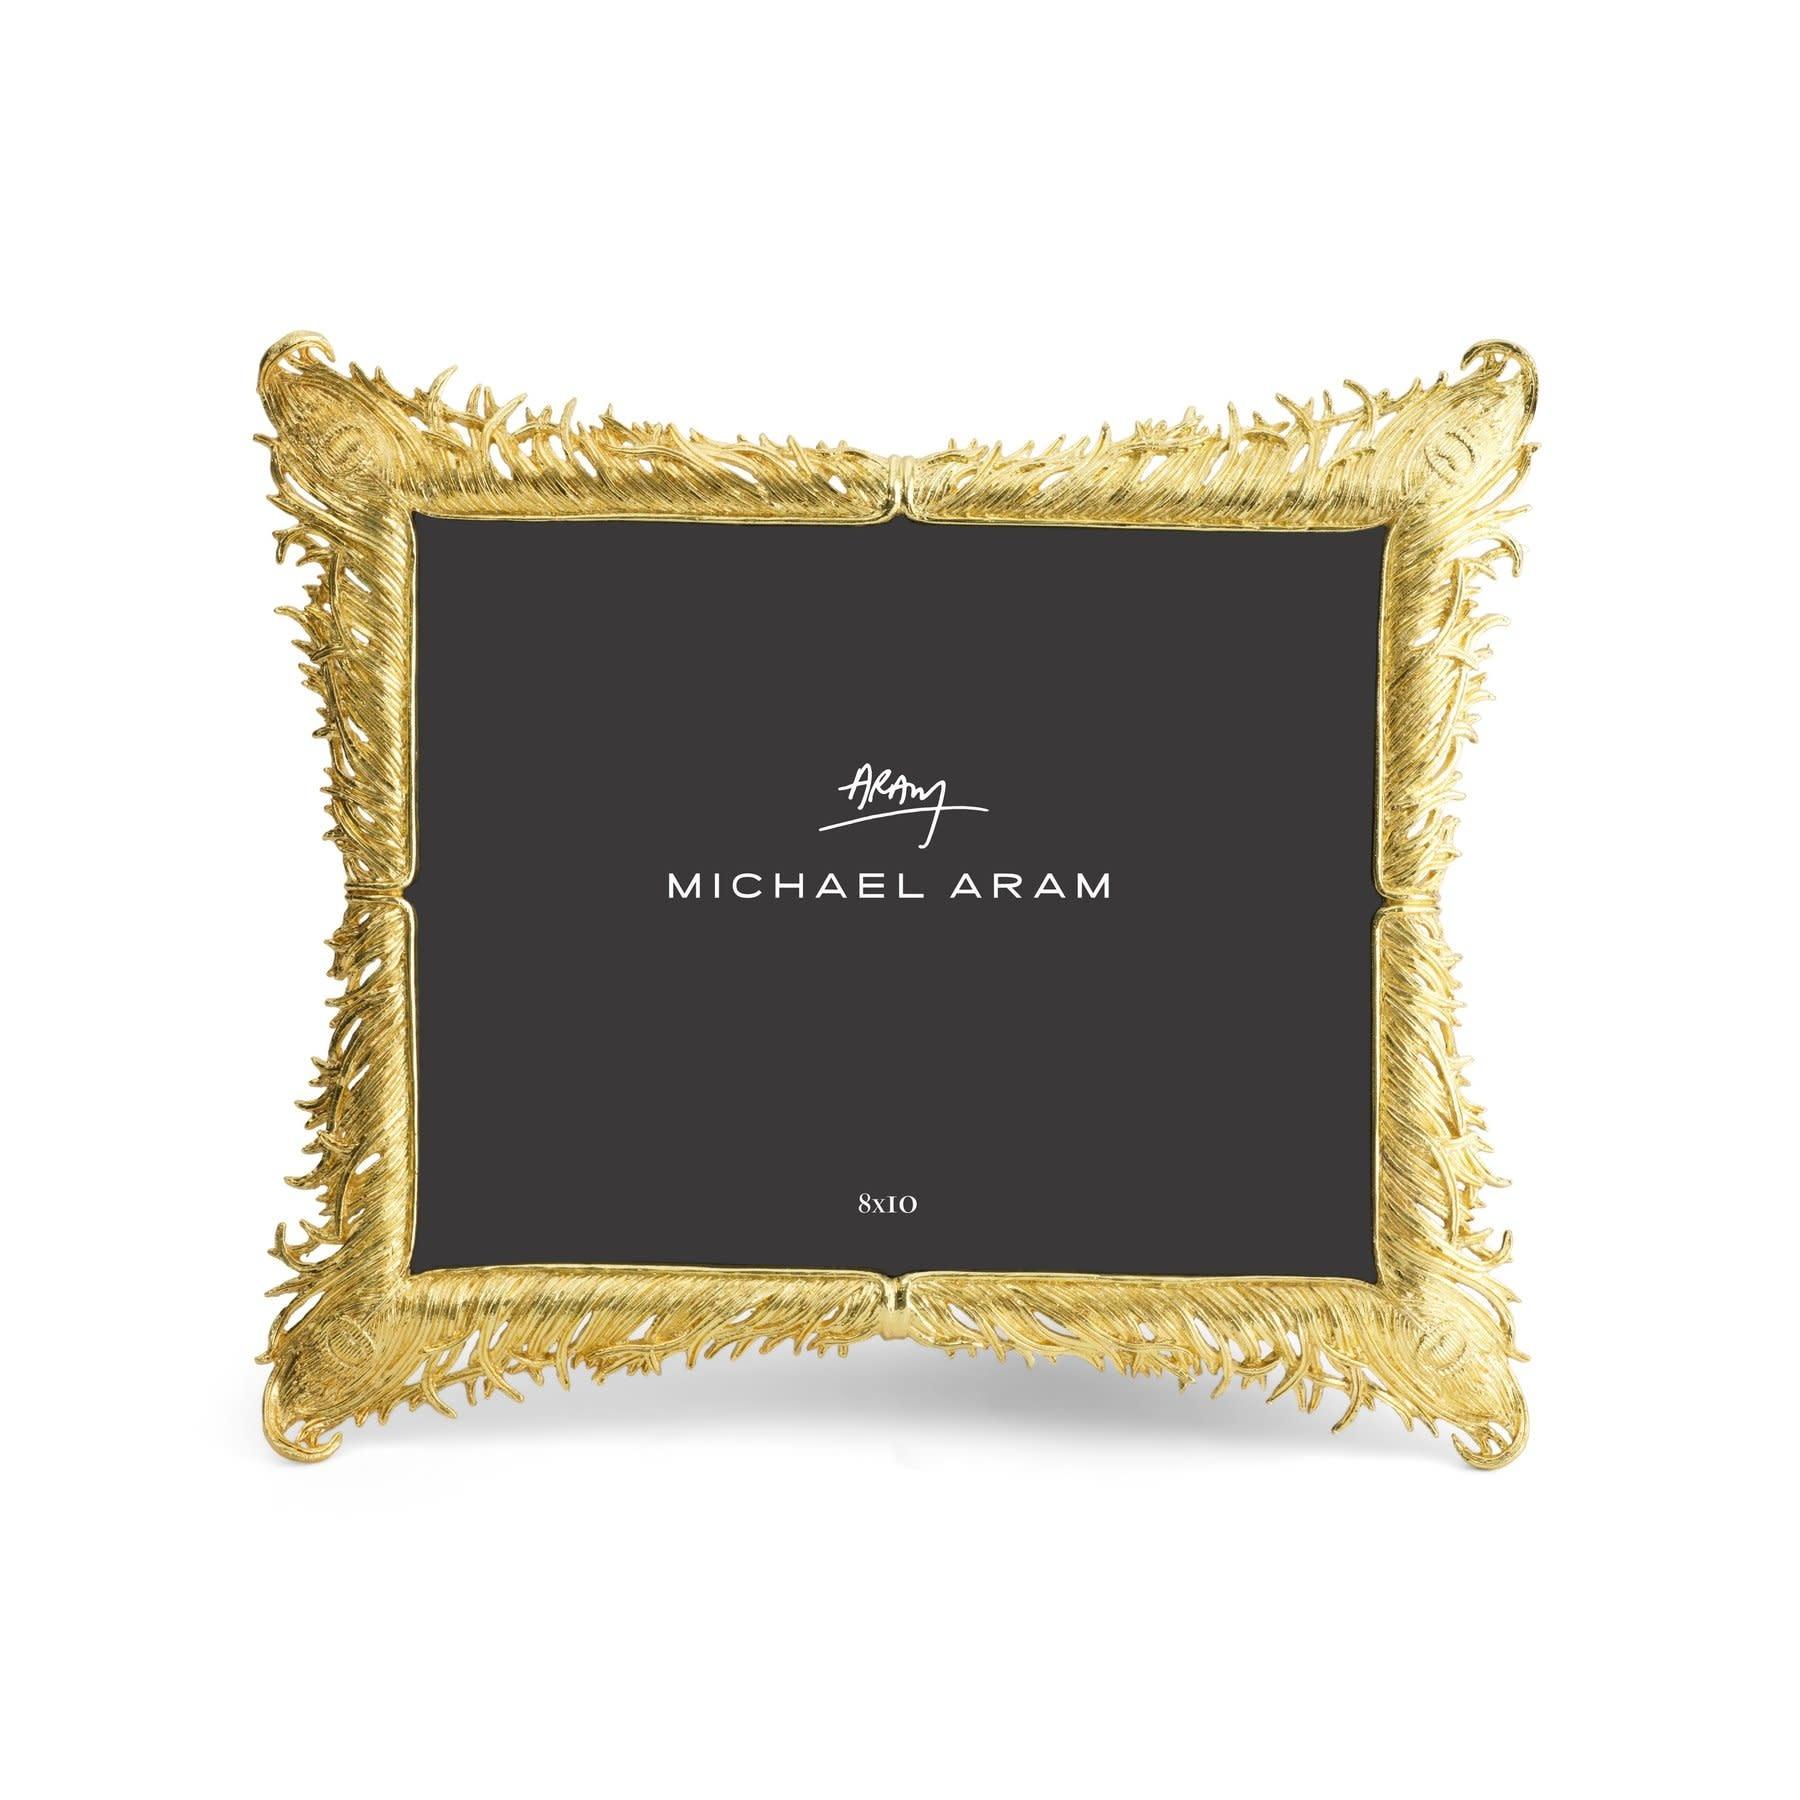 Michael Aram Plume Frame 8x10